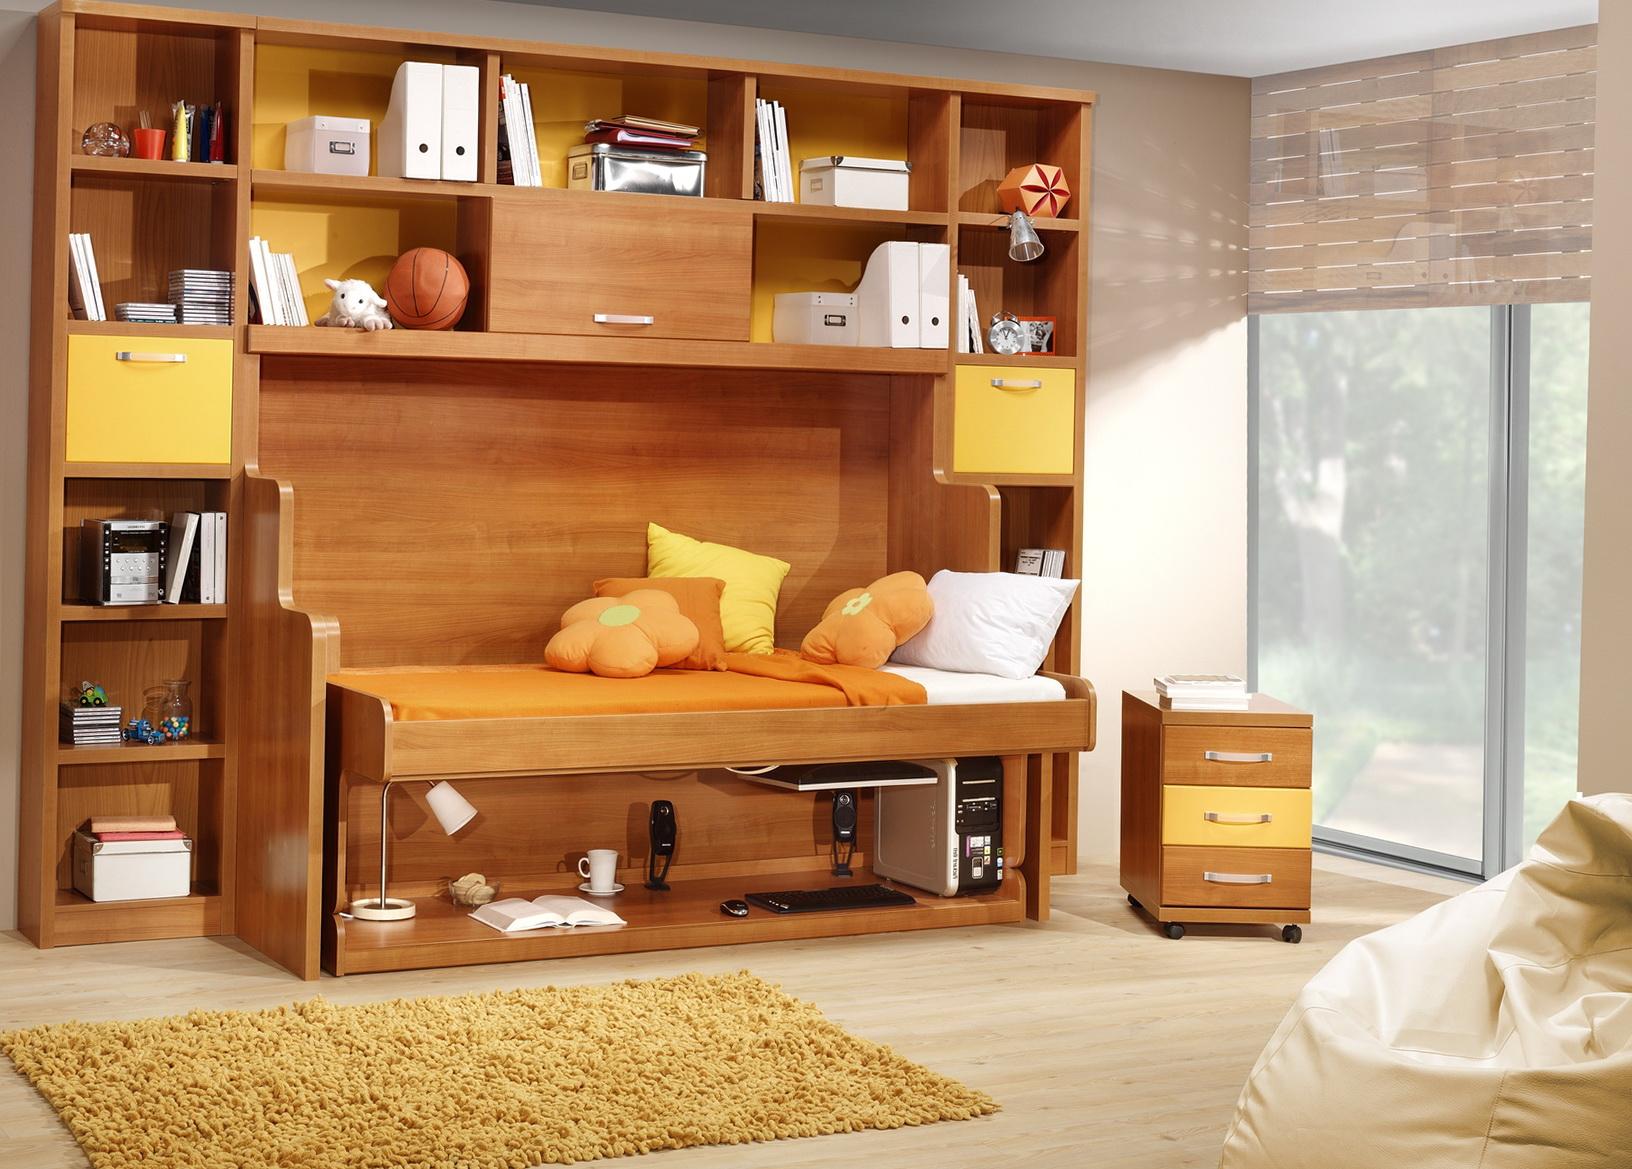 Permalink to Bookshelf With Drawers Target